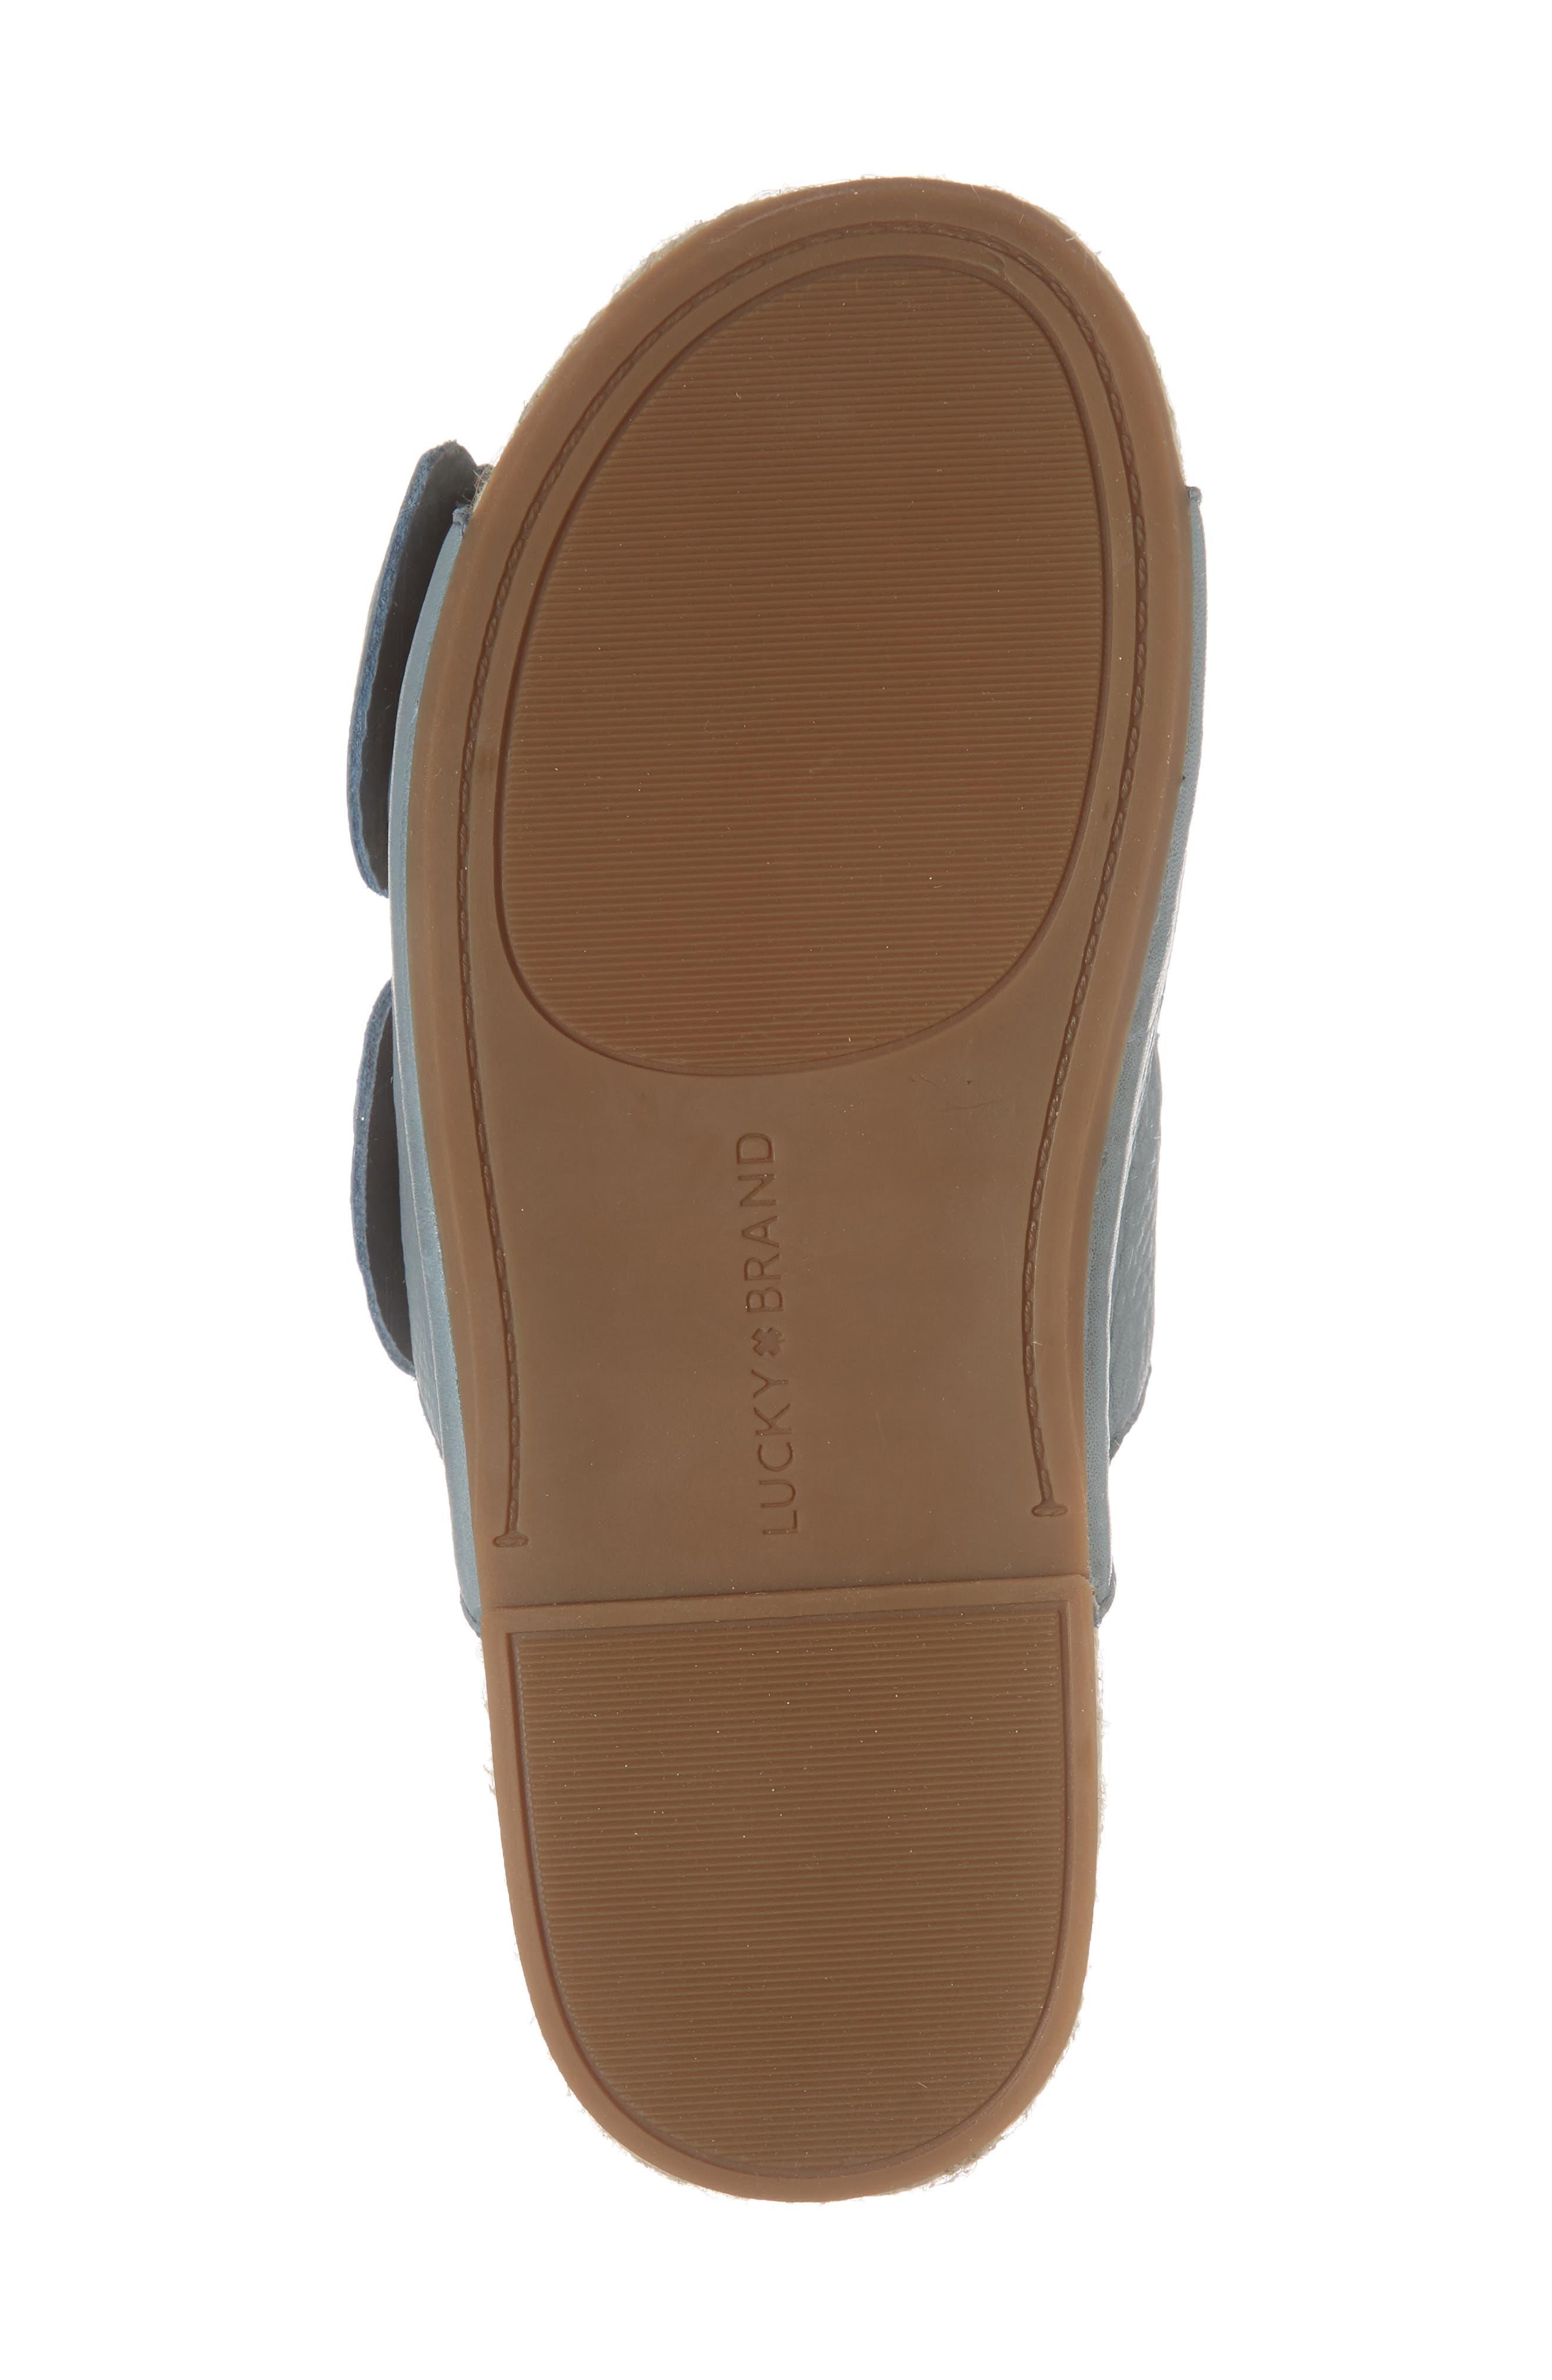 Izbremma Platform Espadrille Sandal,                             Alternate thumbnail 6, color,                             Infinity Leather